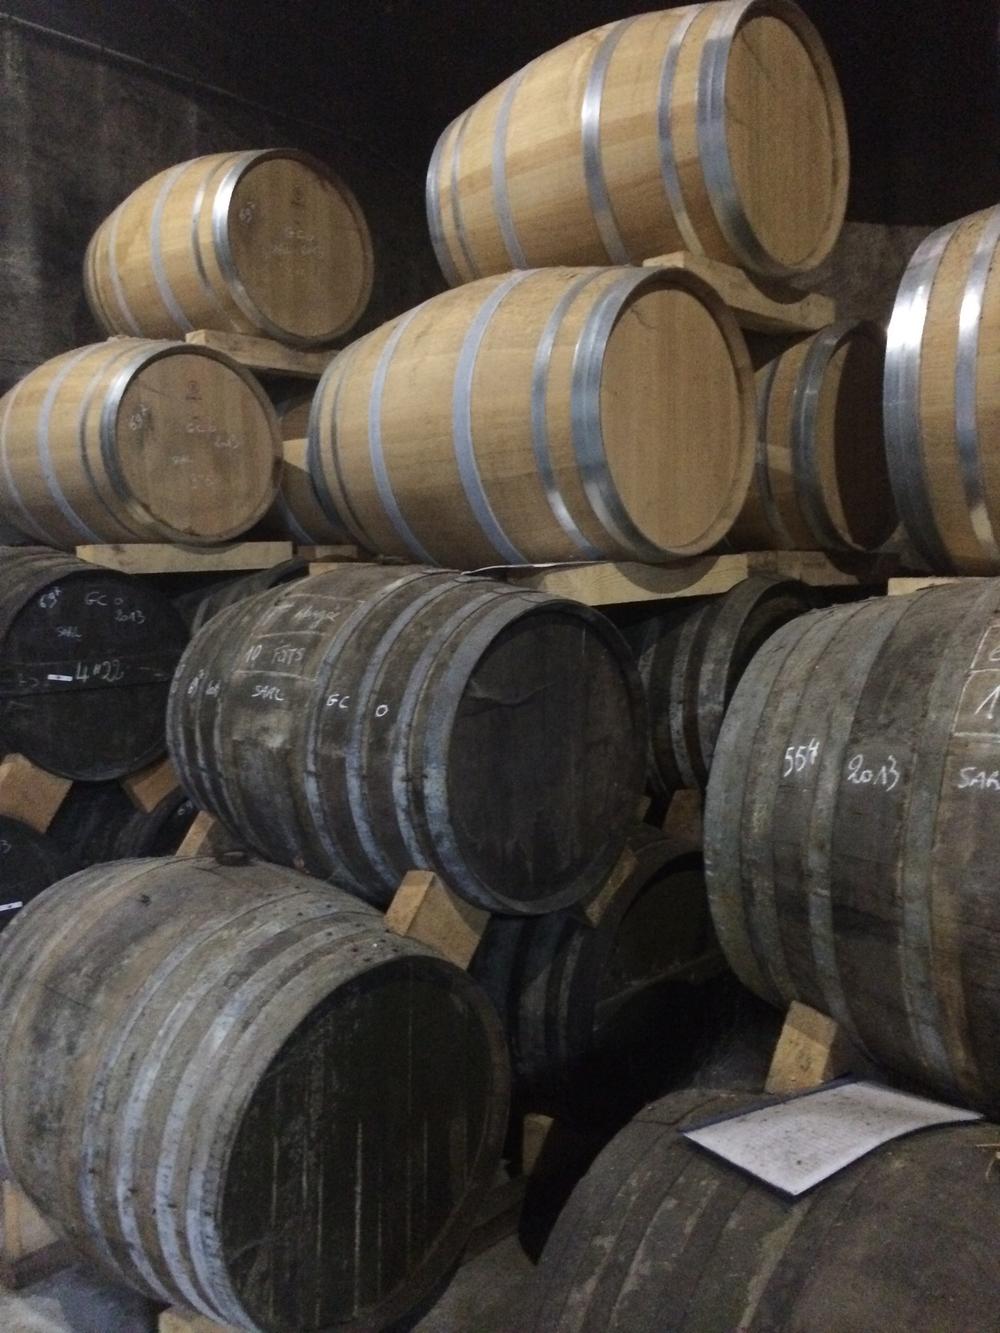 Pierre Ferrand Barrels Dry Cellar3.jpg